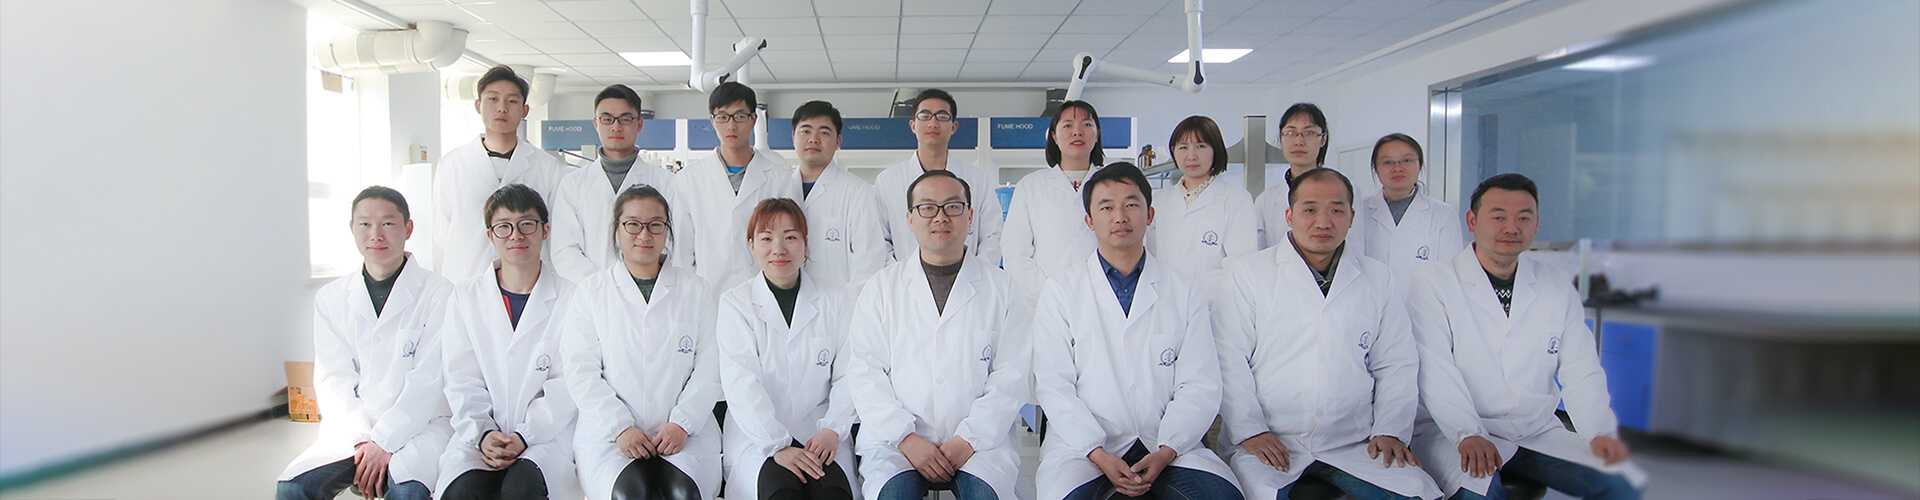 标准物质-www.bzwz.com国家标准物质网